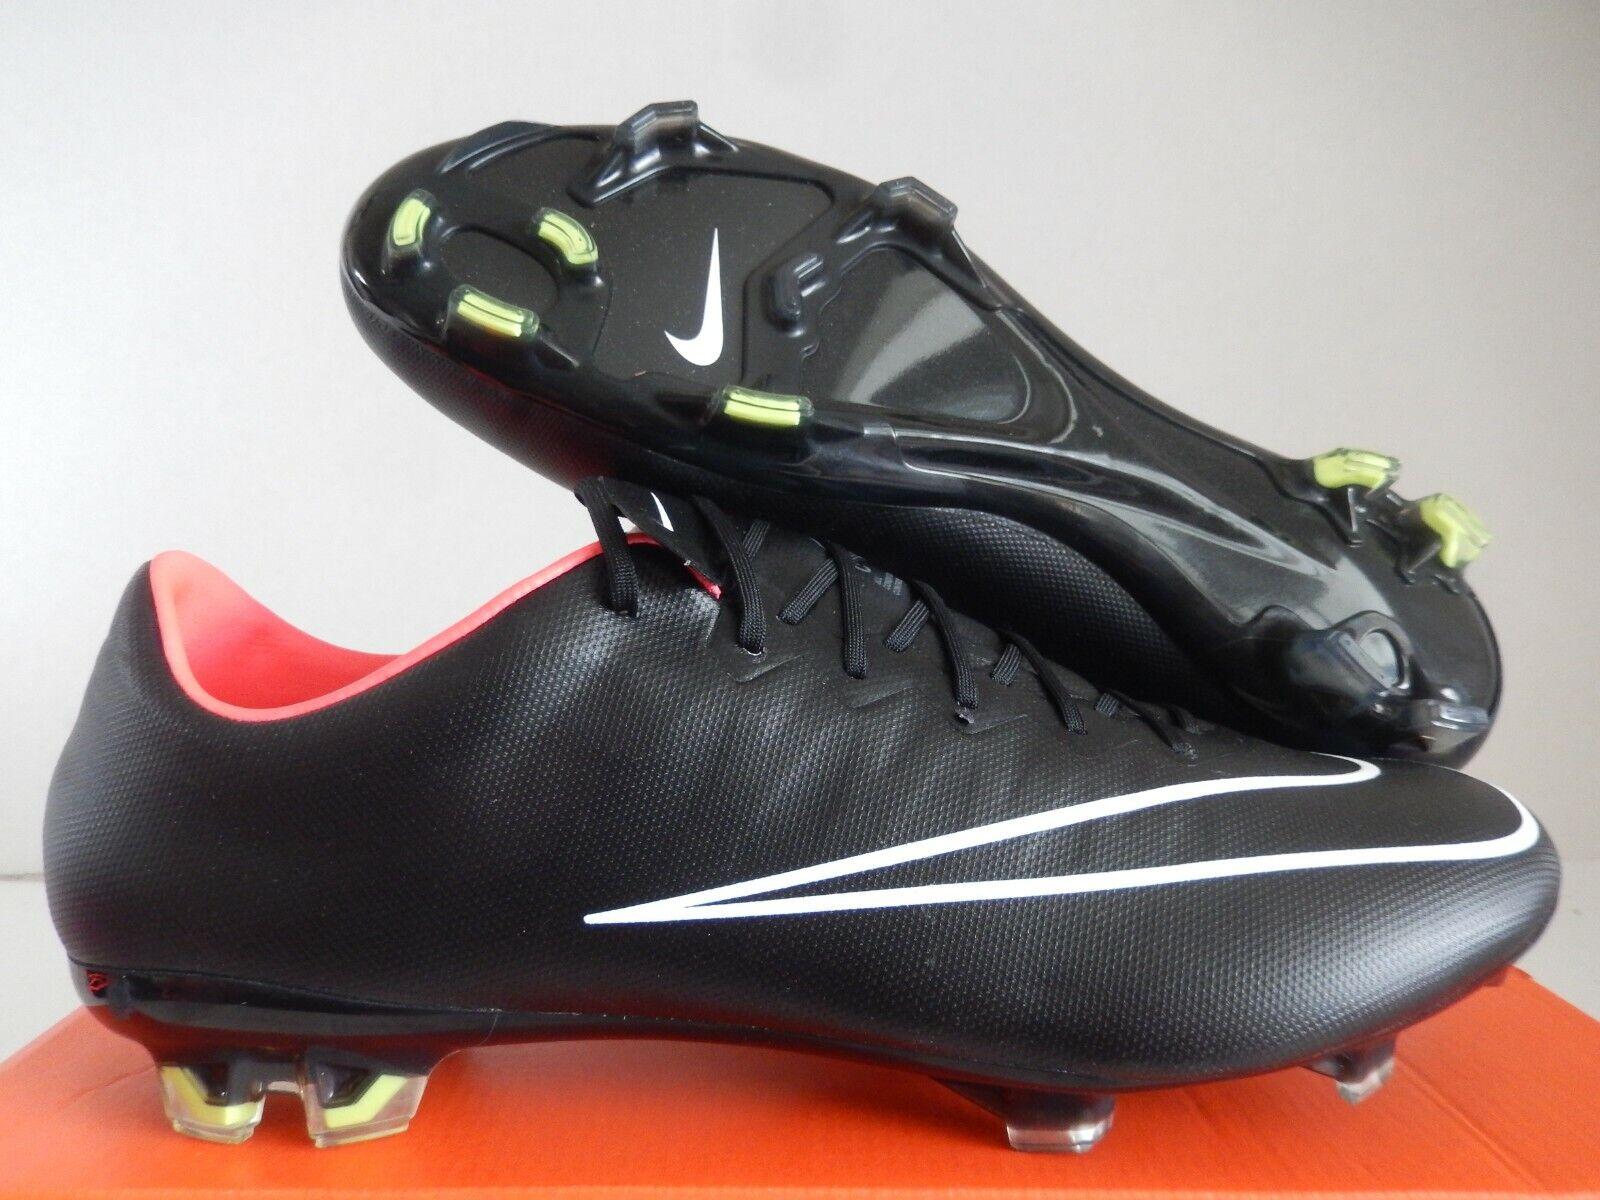 Concesión tipo Aproximación  Nike Mercurial Vapor X FG White Black Volt Total Orange 648553-107 Size  10.5 for sale online | eBay